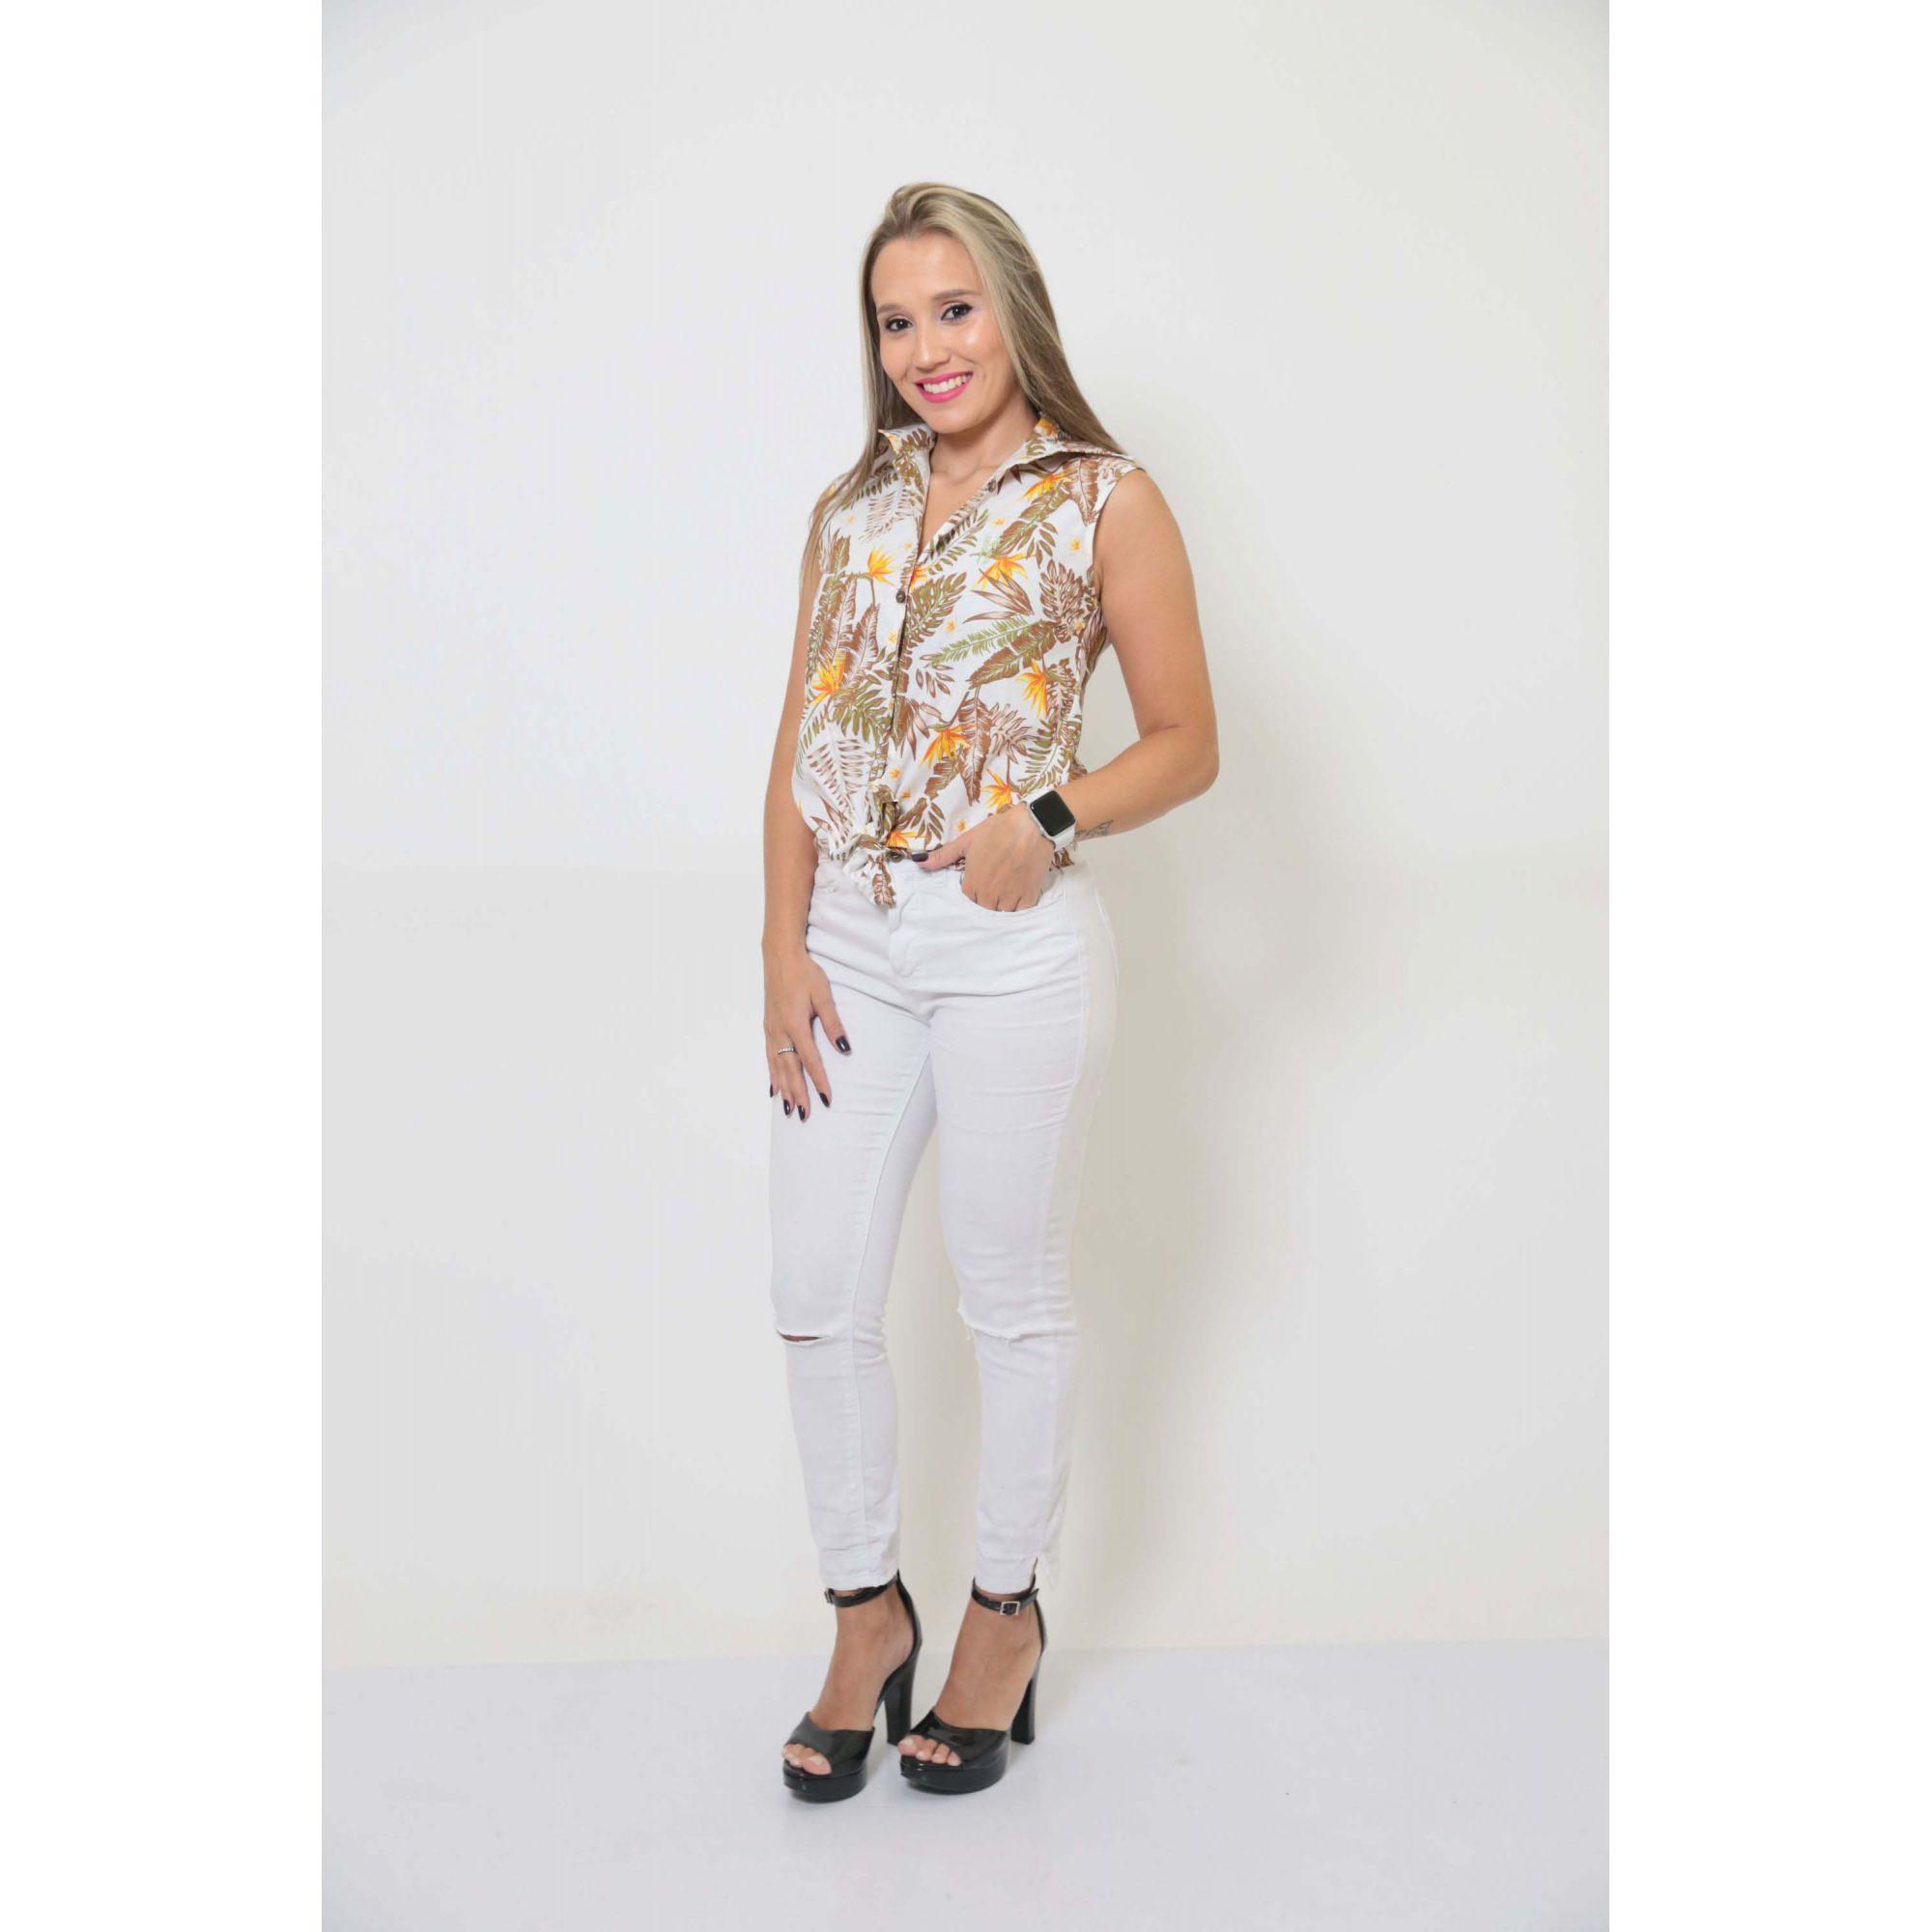 MÃE E FILHA > Kit 02 Camisas Social - Adulto e Infantil Amazonas [Coleção Tal Mãe Tal Filha]  - Heitor Fashion Brazil